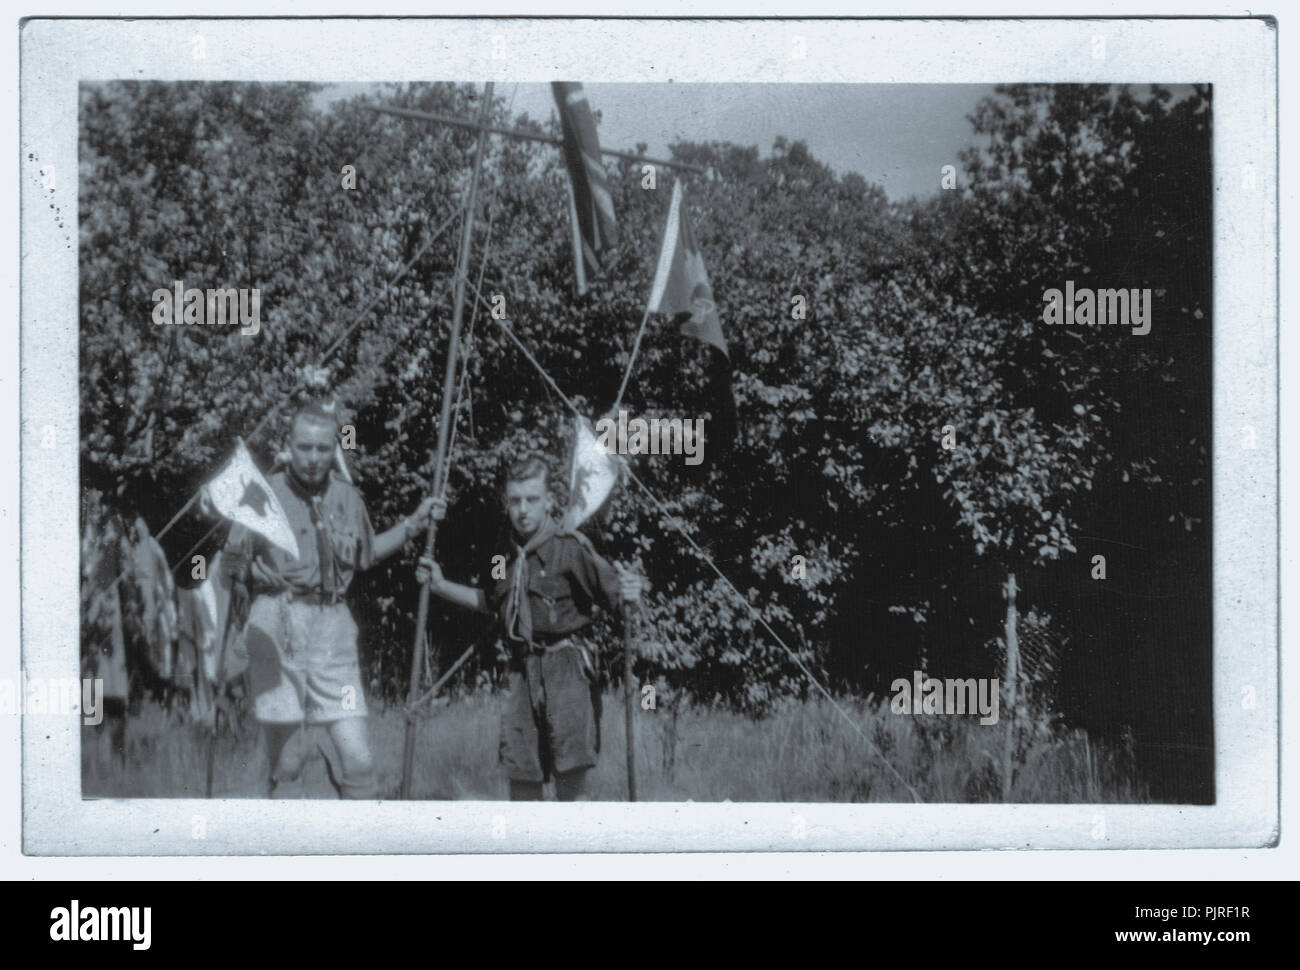 5° World Scout Jamboree, svoltasi a Bloemendaal Vogelenzang Holland, Paesi Bassi,1937 Immagini Stock